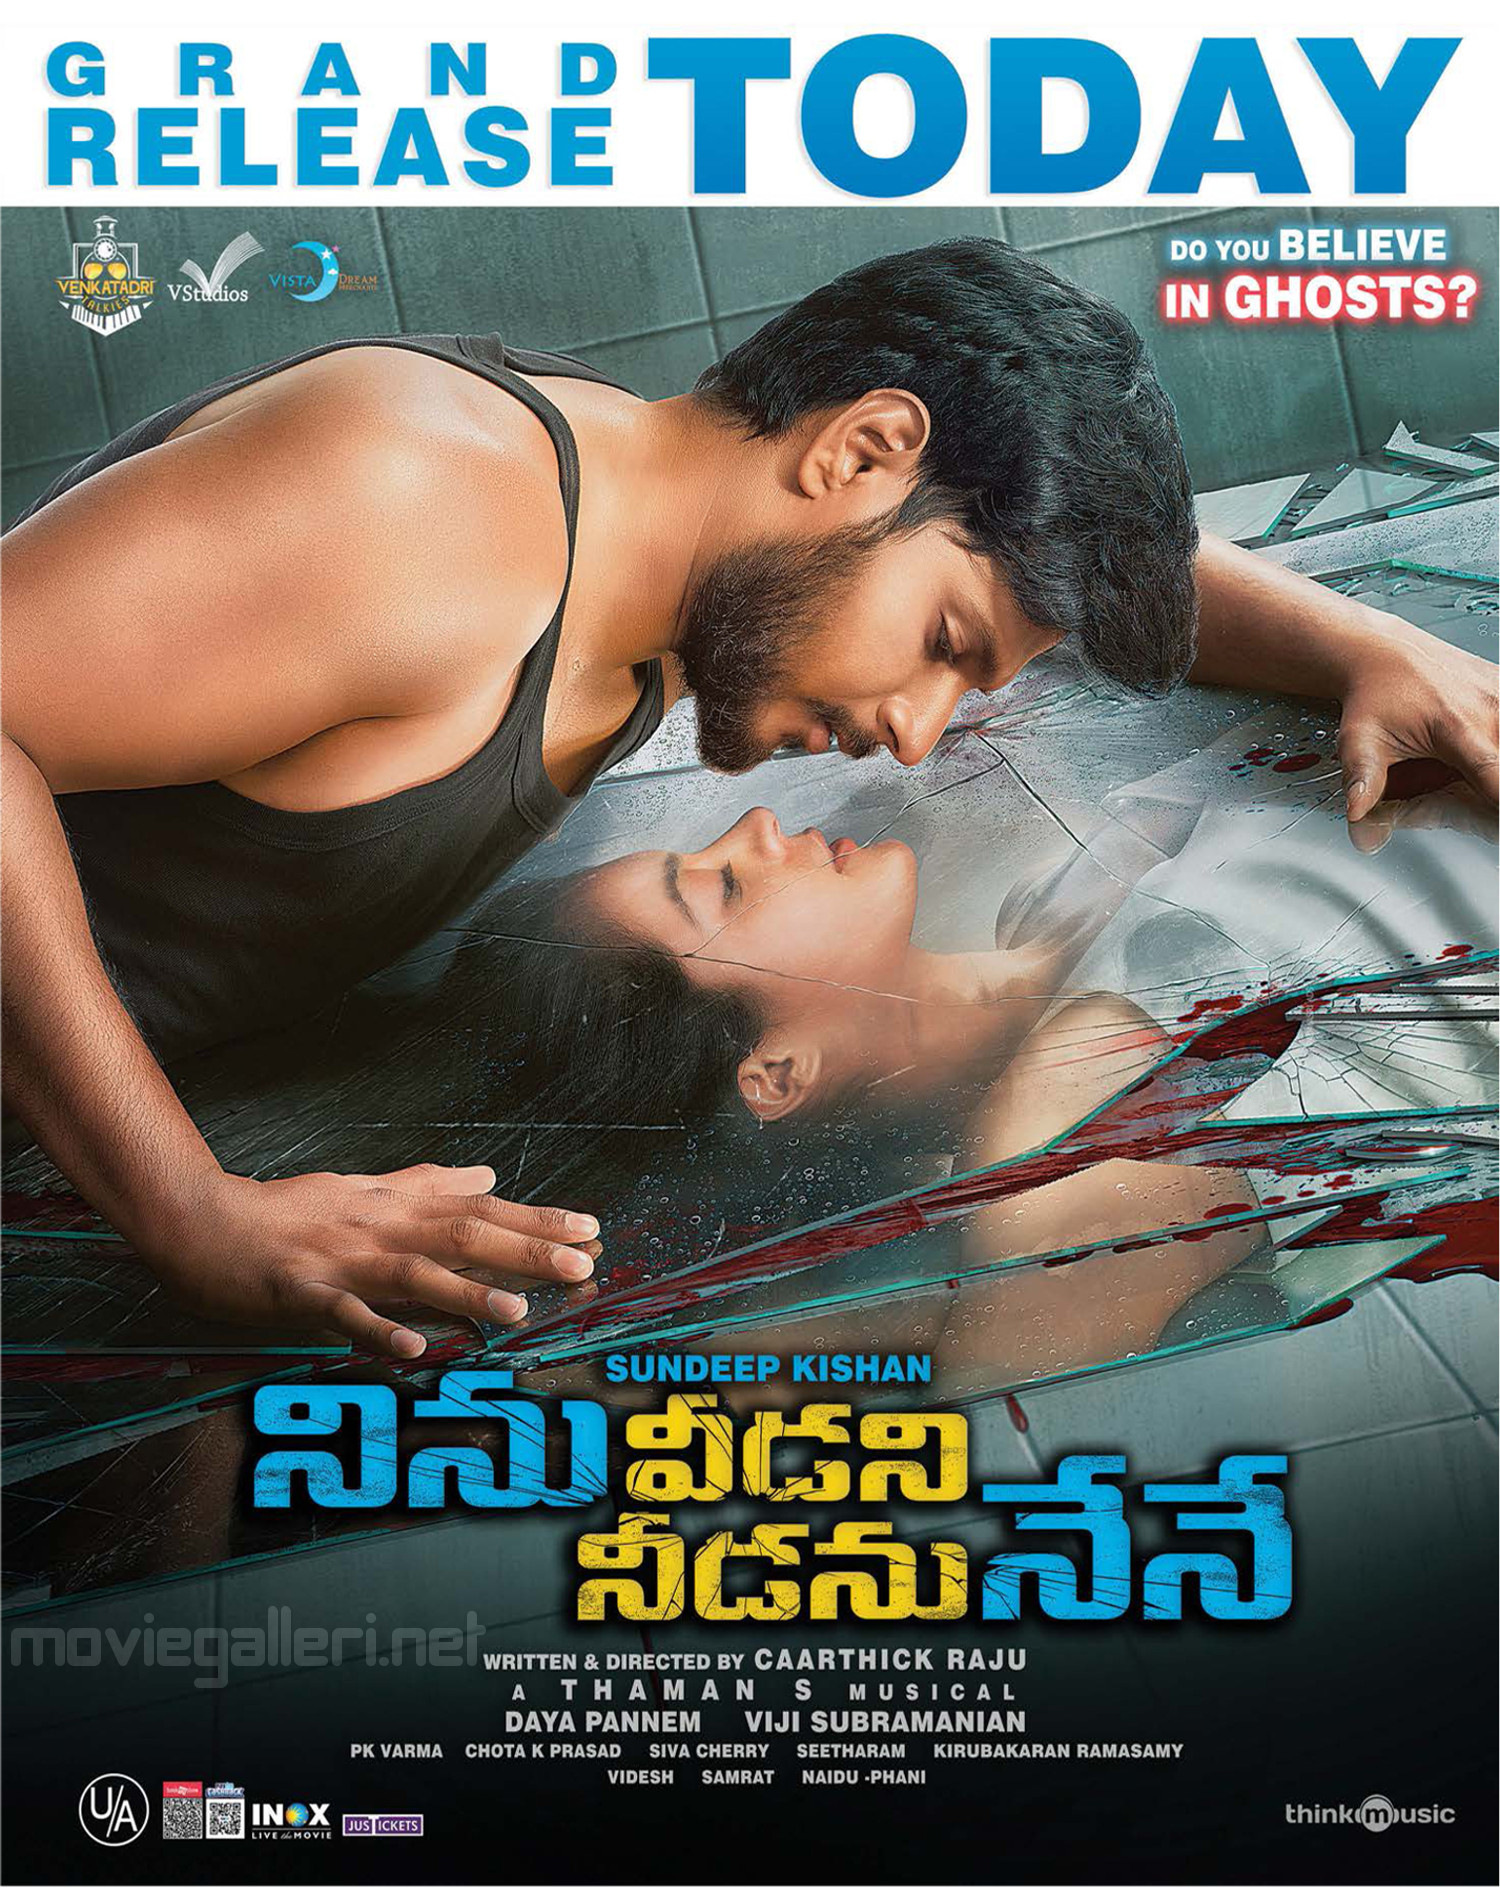 Sundeep Kishan Anya Singh Ninu Veedani Needanu Nene Movie Grand Release Today Posters